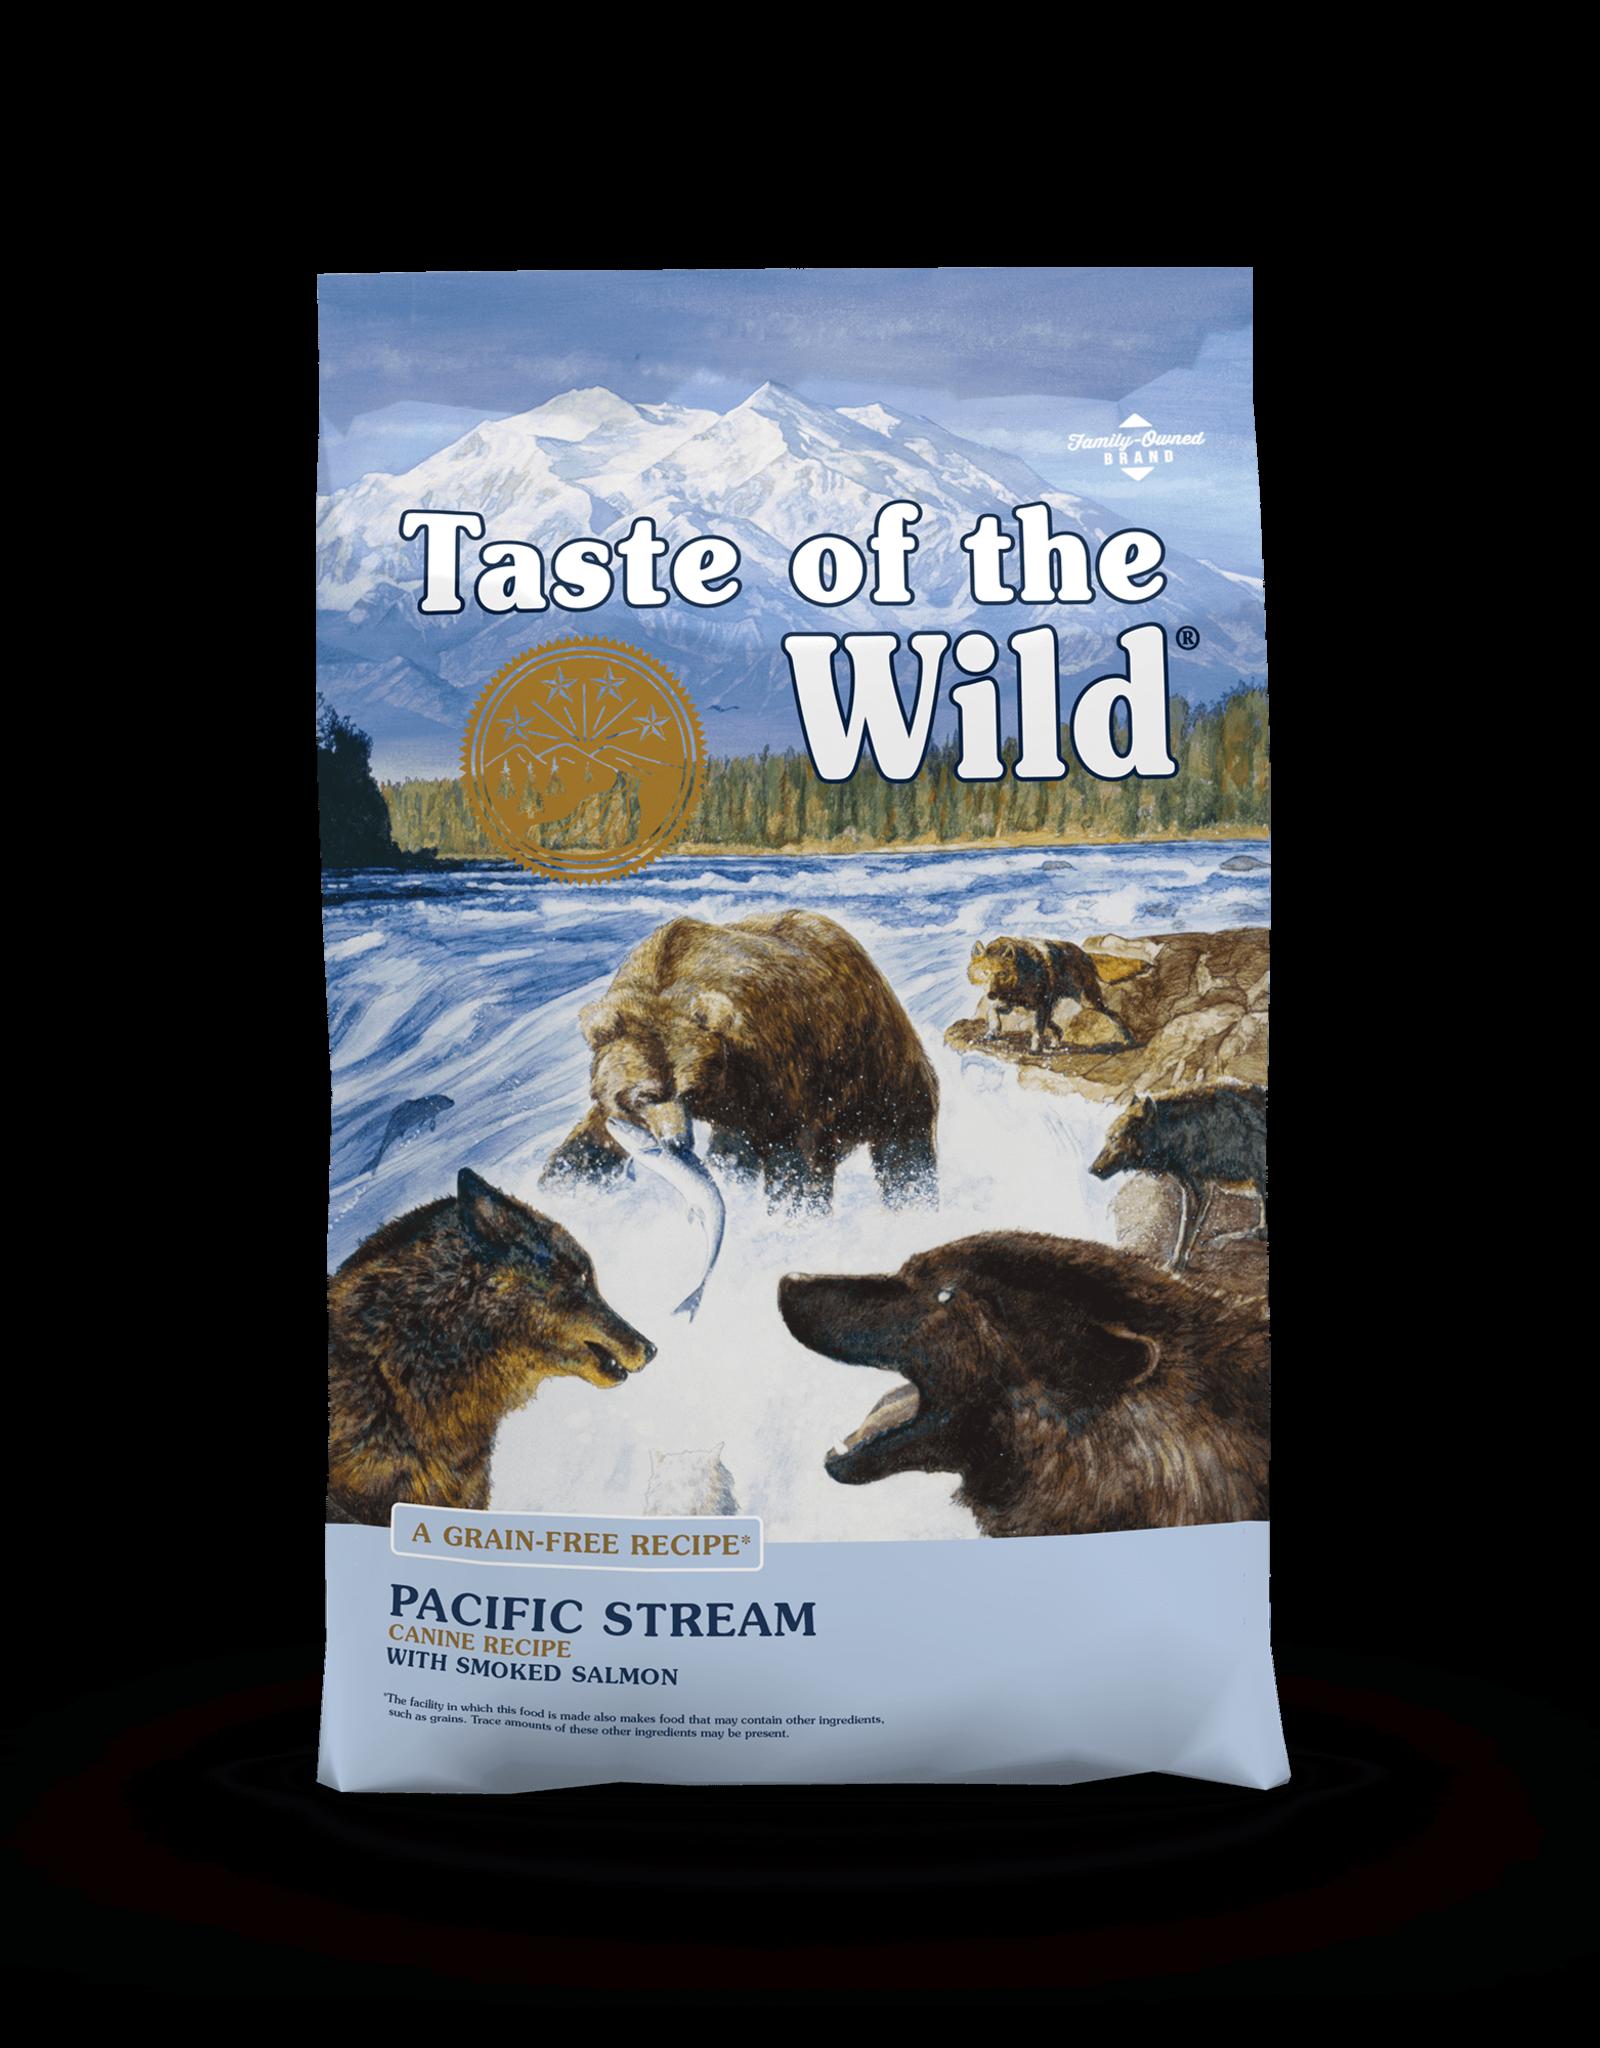 Taste of the Wild Pet Food Dog Pacific Stream Recipe - Grain-Free 28lb